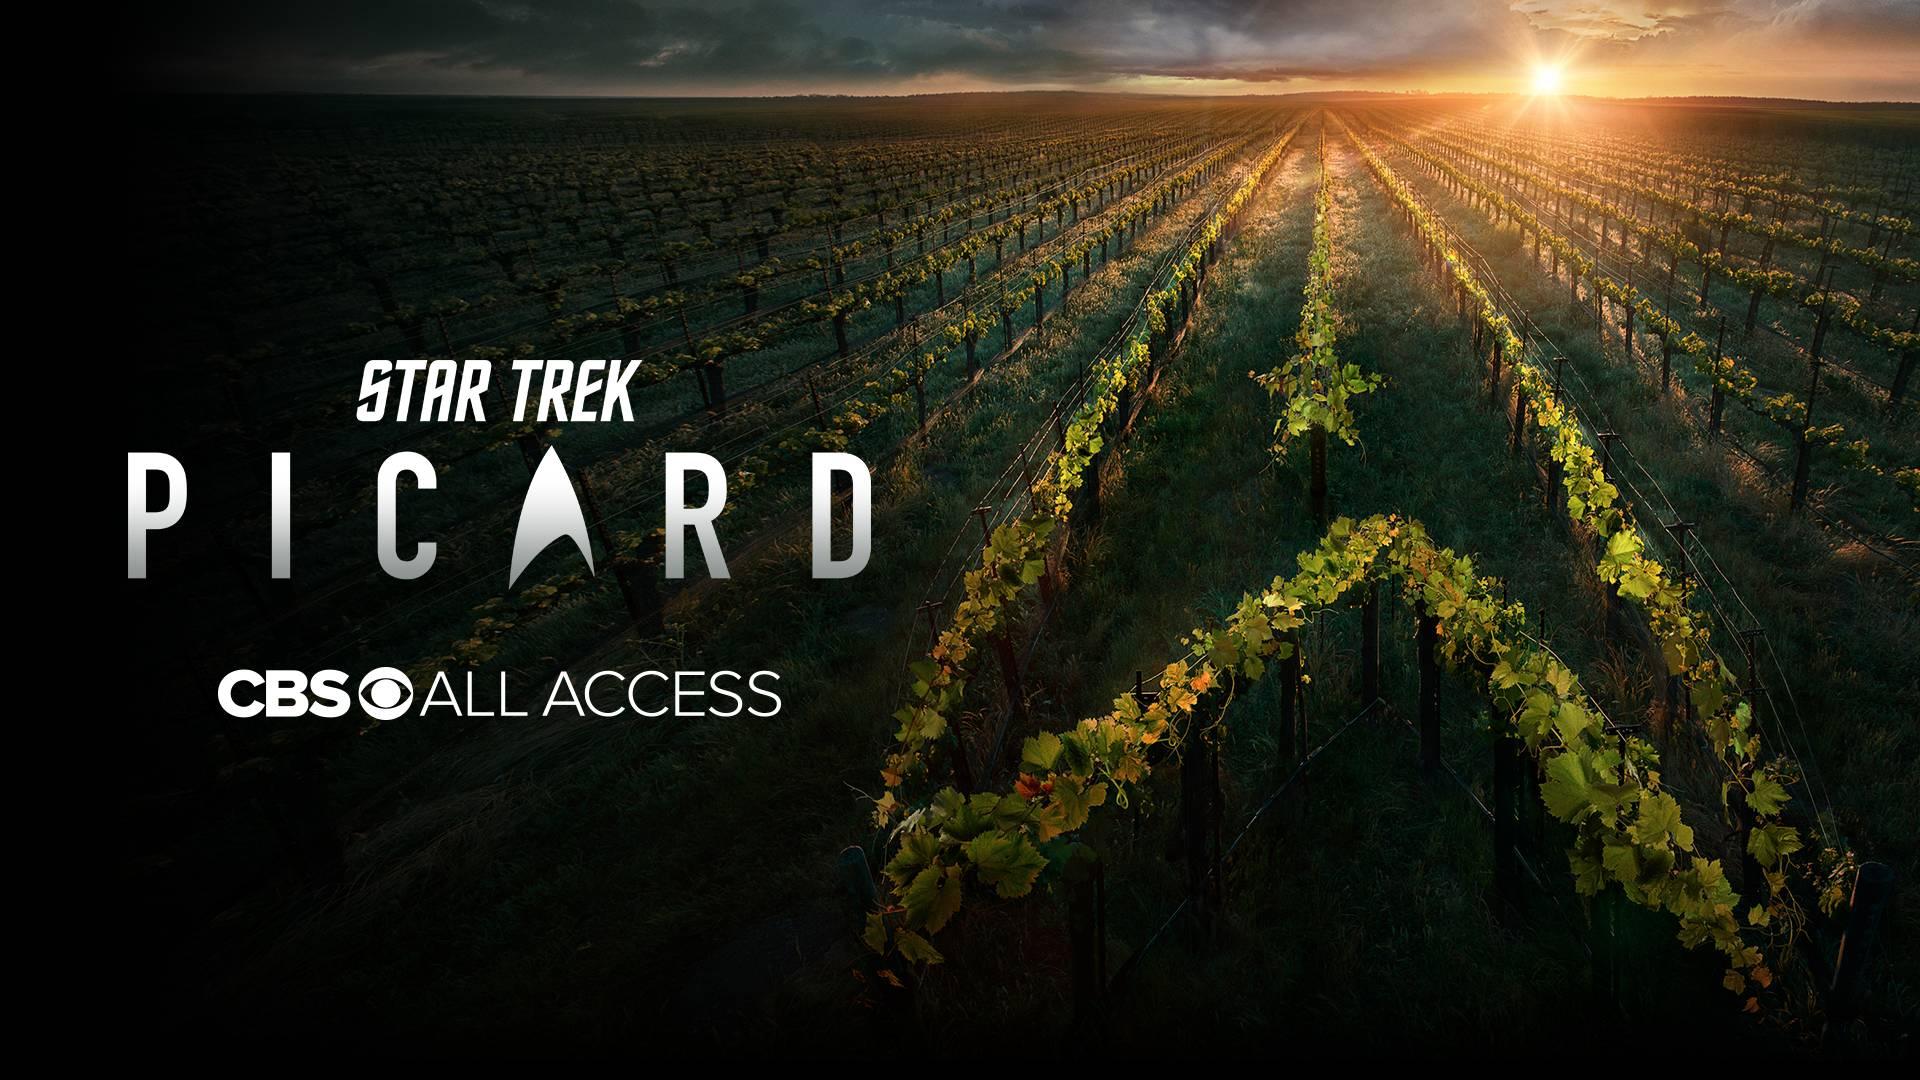 [Série] Star Trek Picard - Page 2 D7rgus10